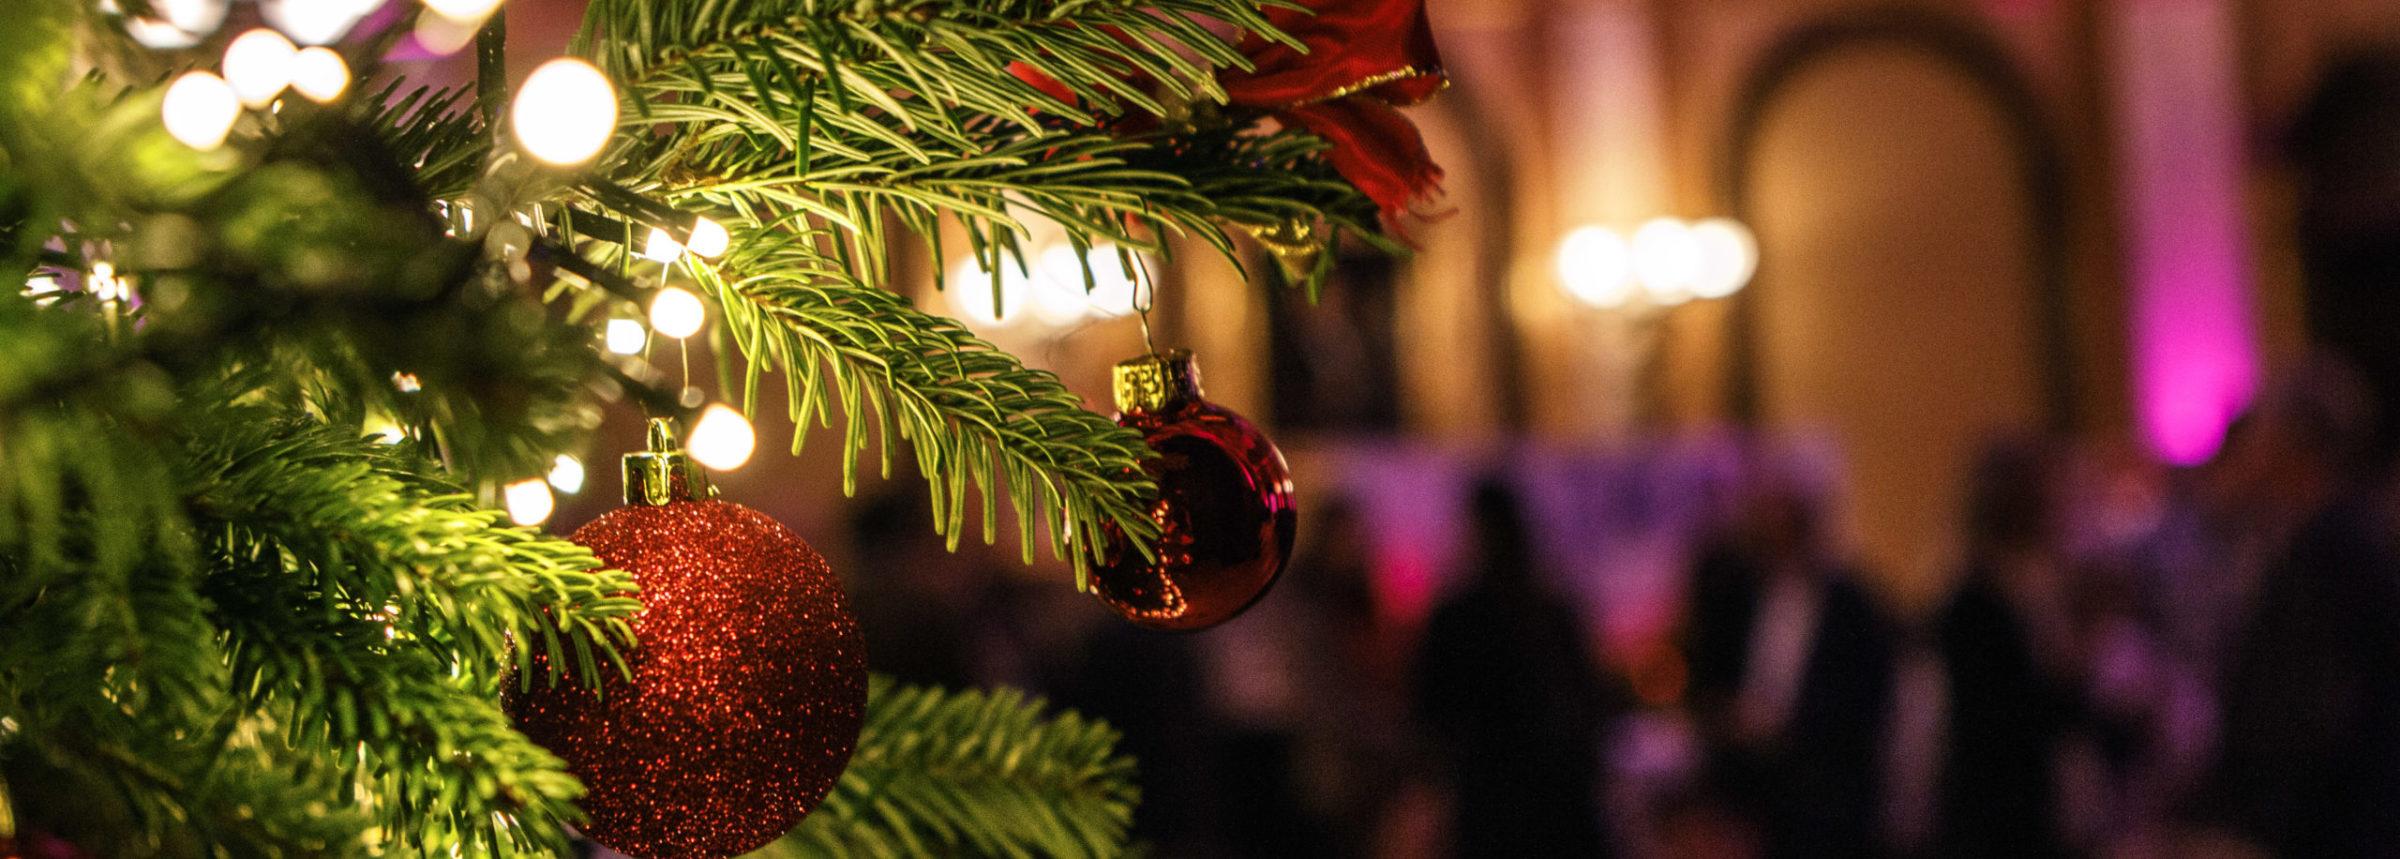 ÖGV Rückblicke: Der ÖGV Weihnachtspunsch